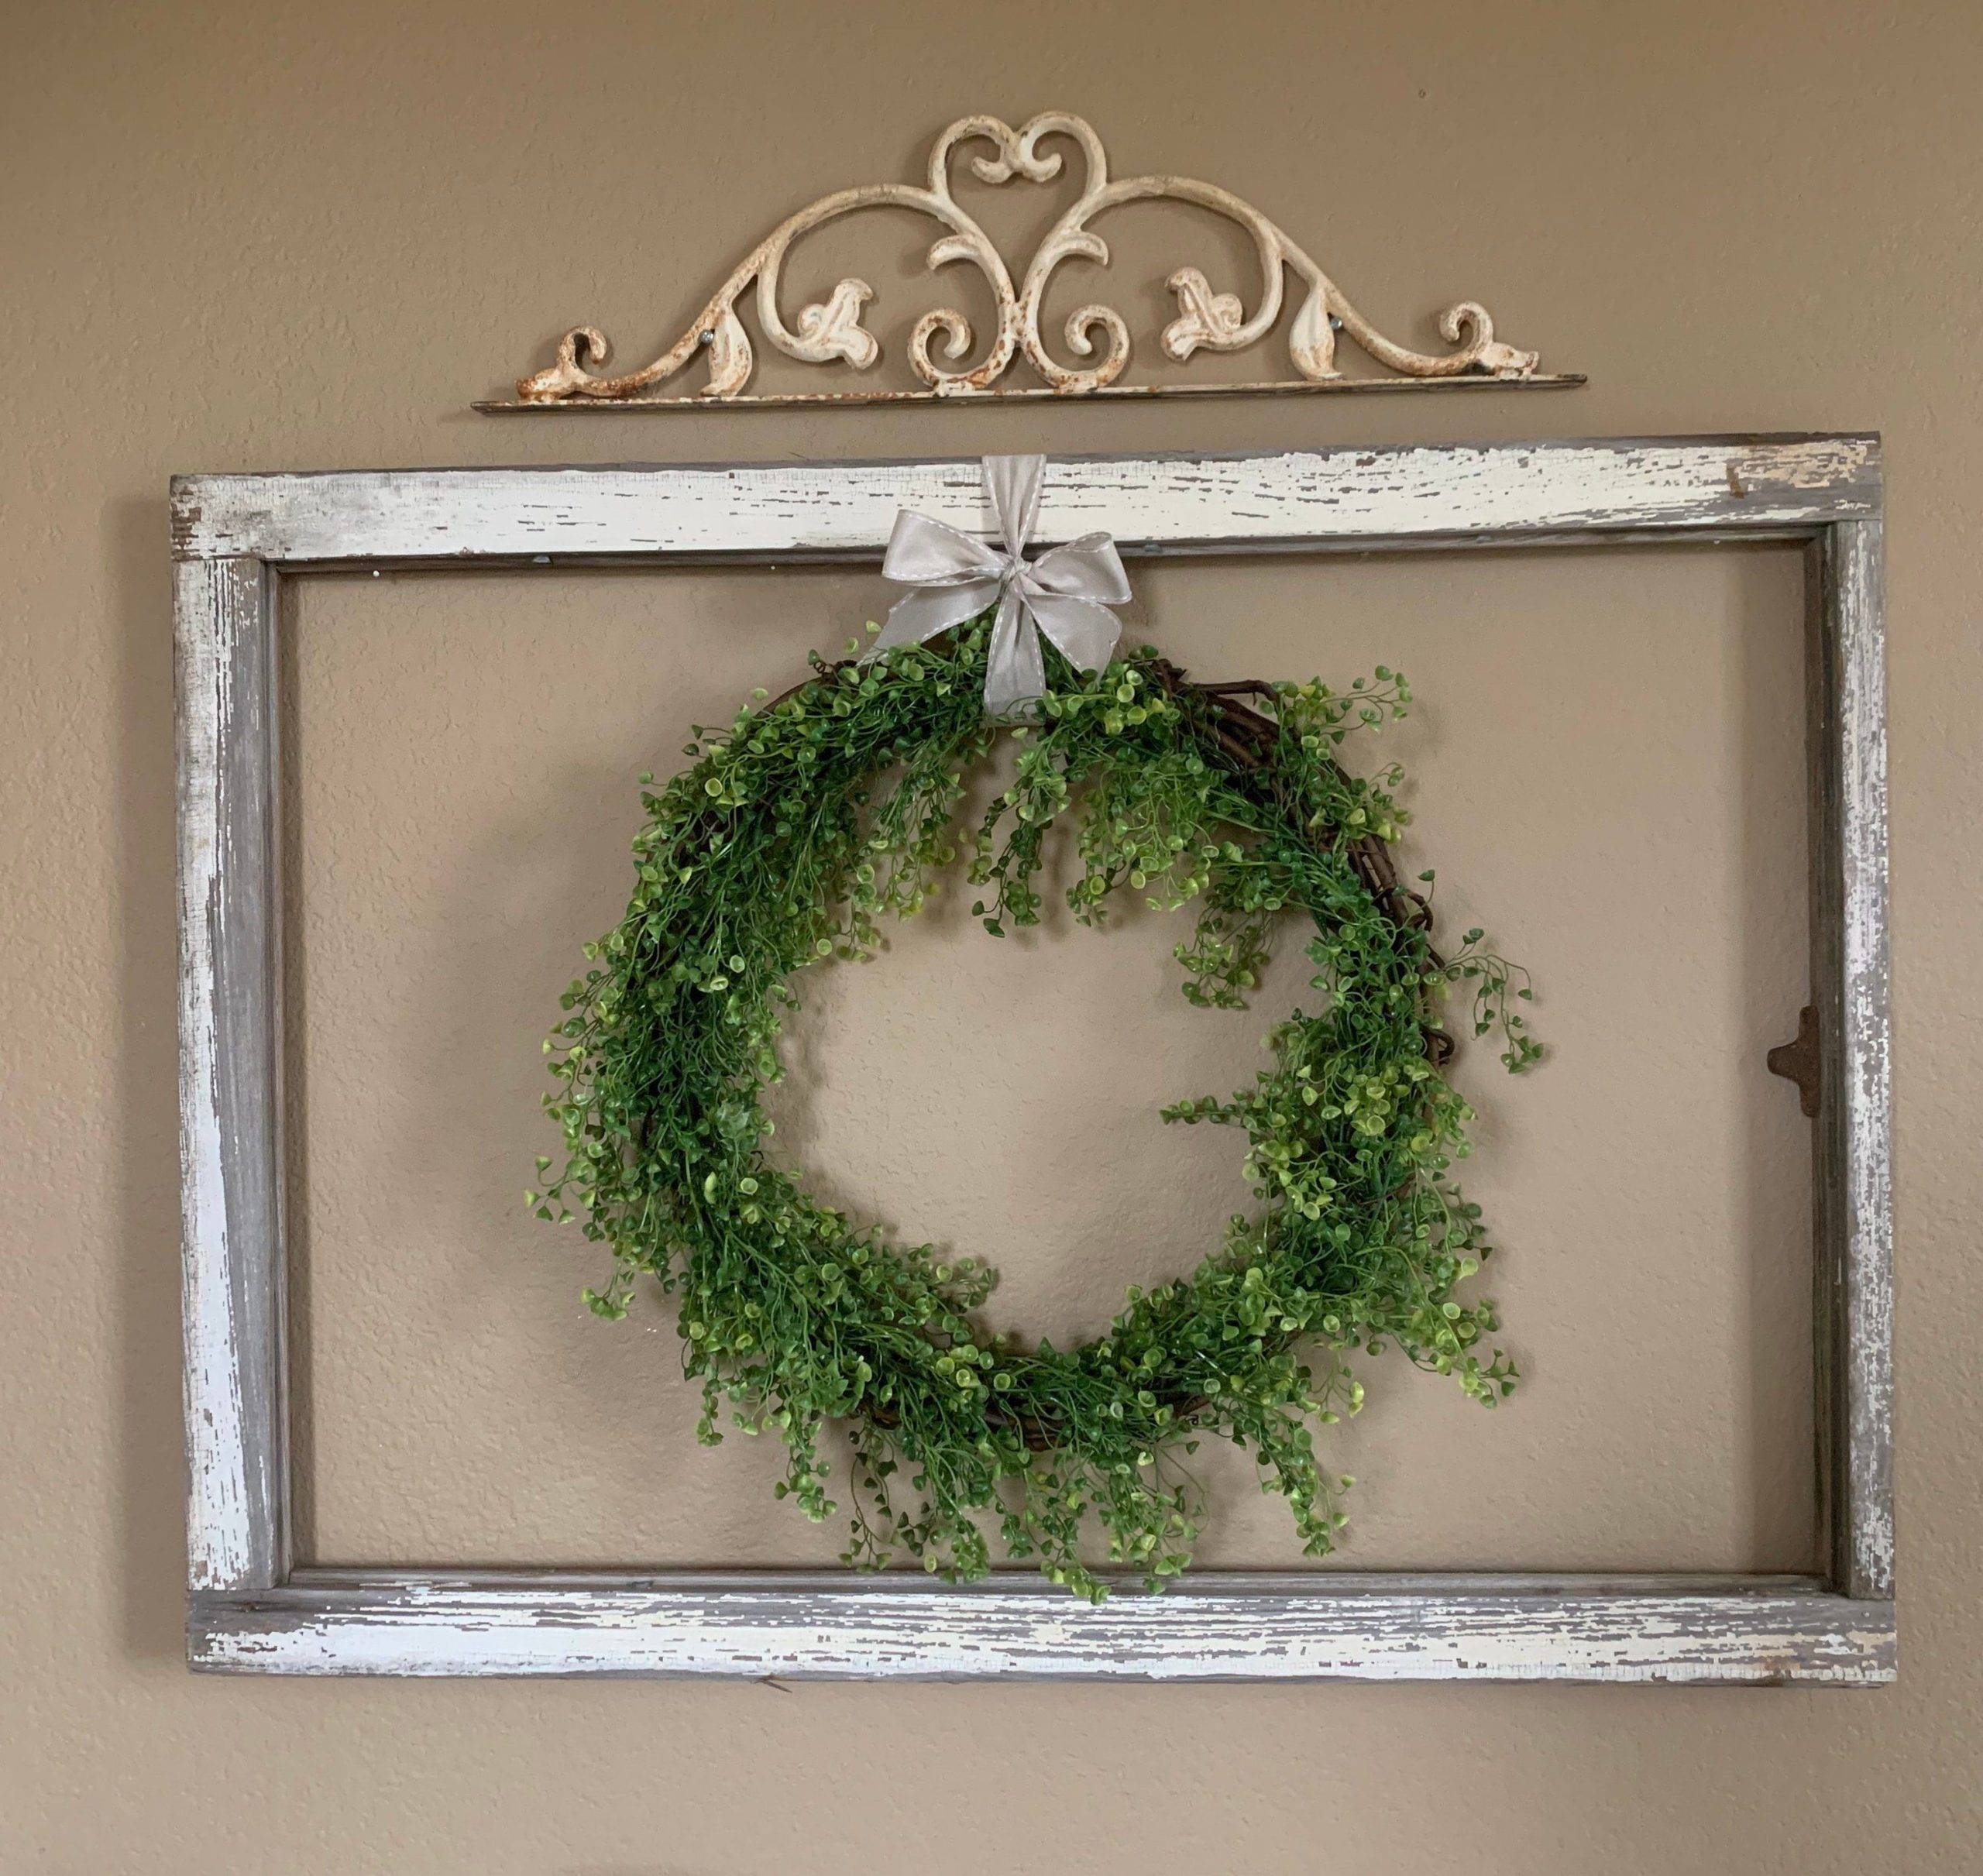 DIY Window Frame and Wreath